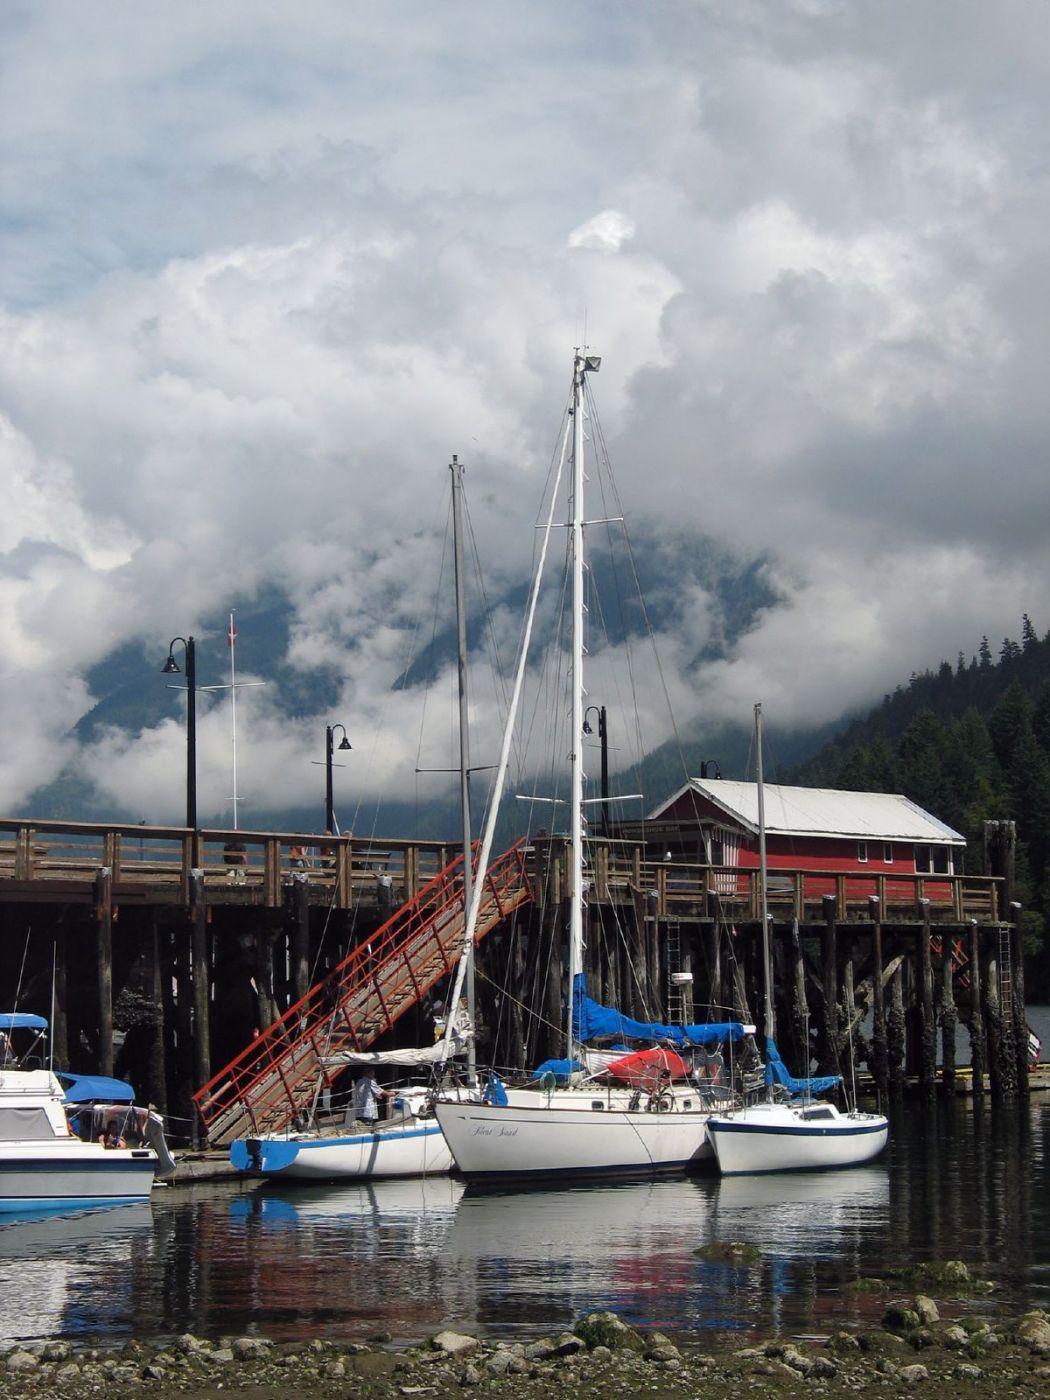 Horseshoe Bay, West Vancouver, Canada, Canada